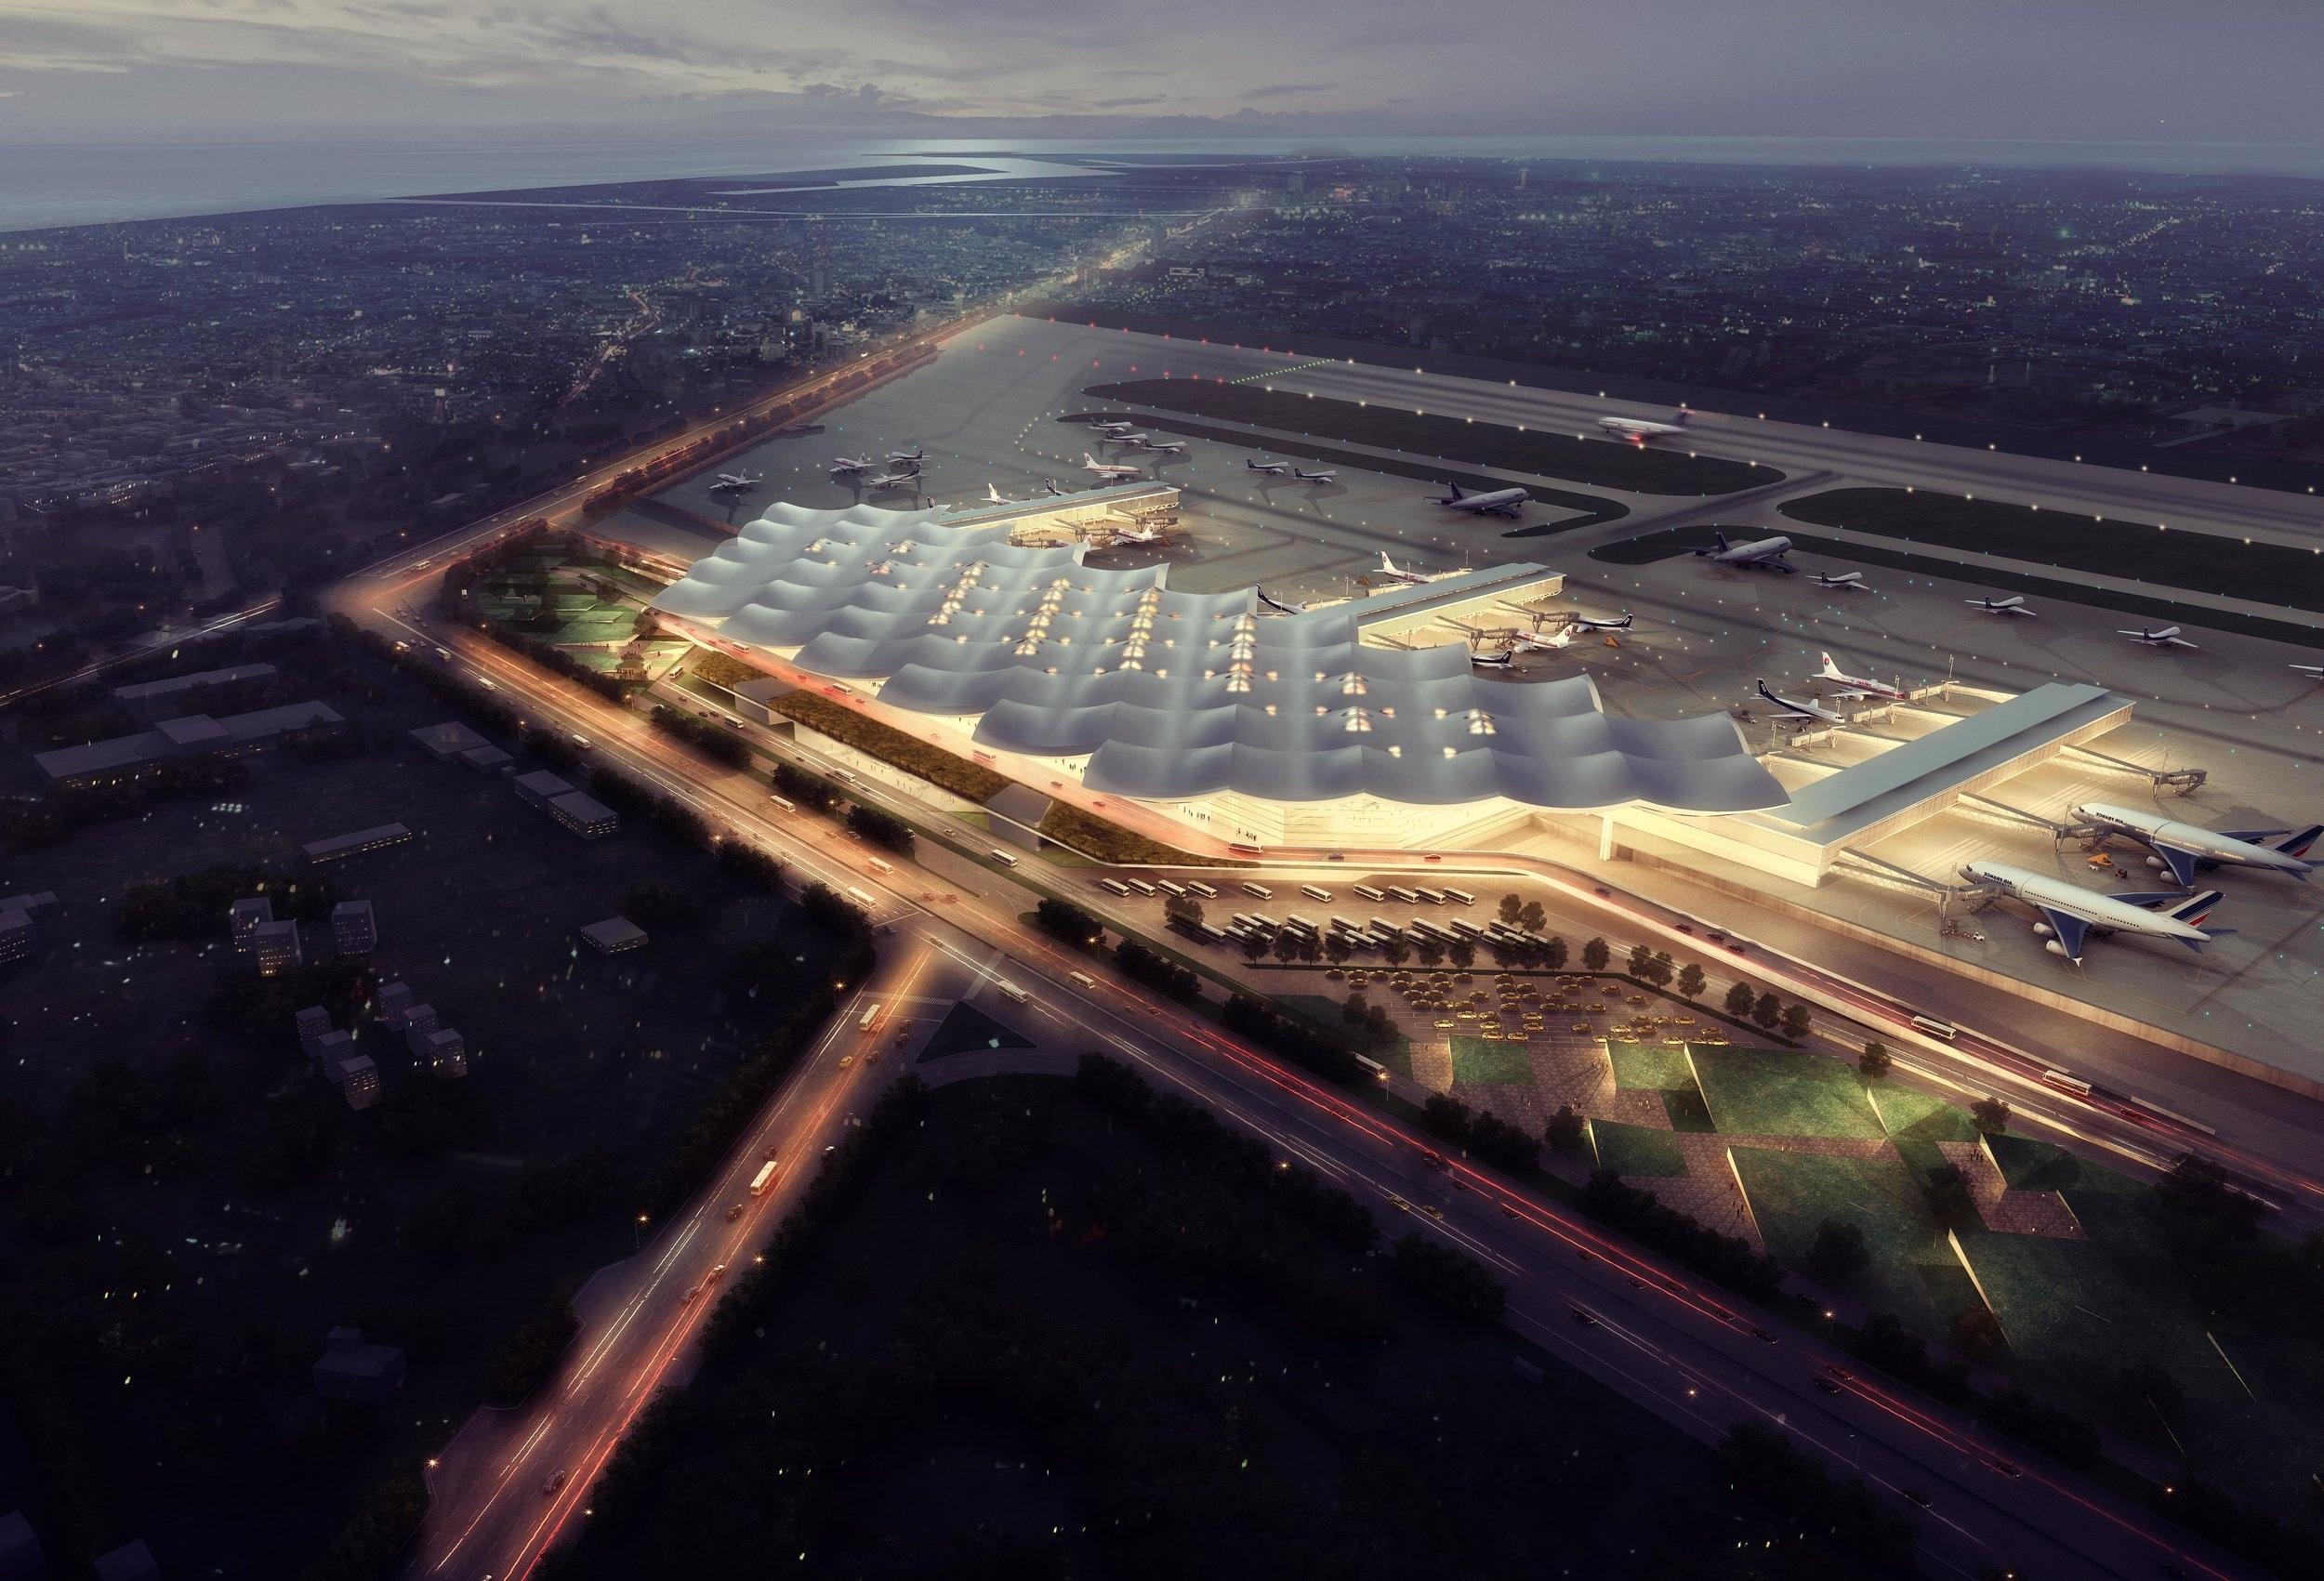 Kaohsiung International Airport 高雄國際機場